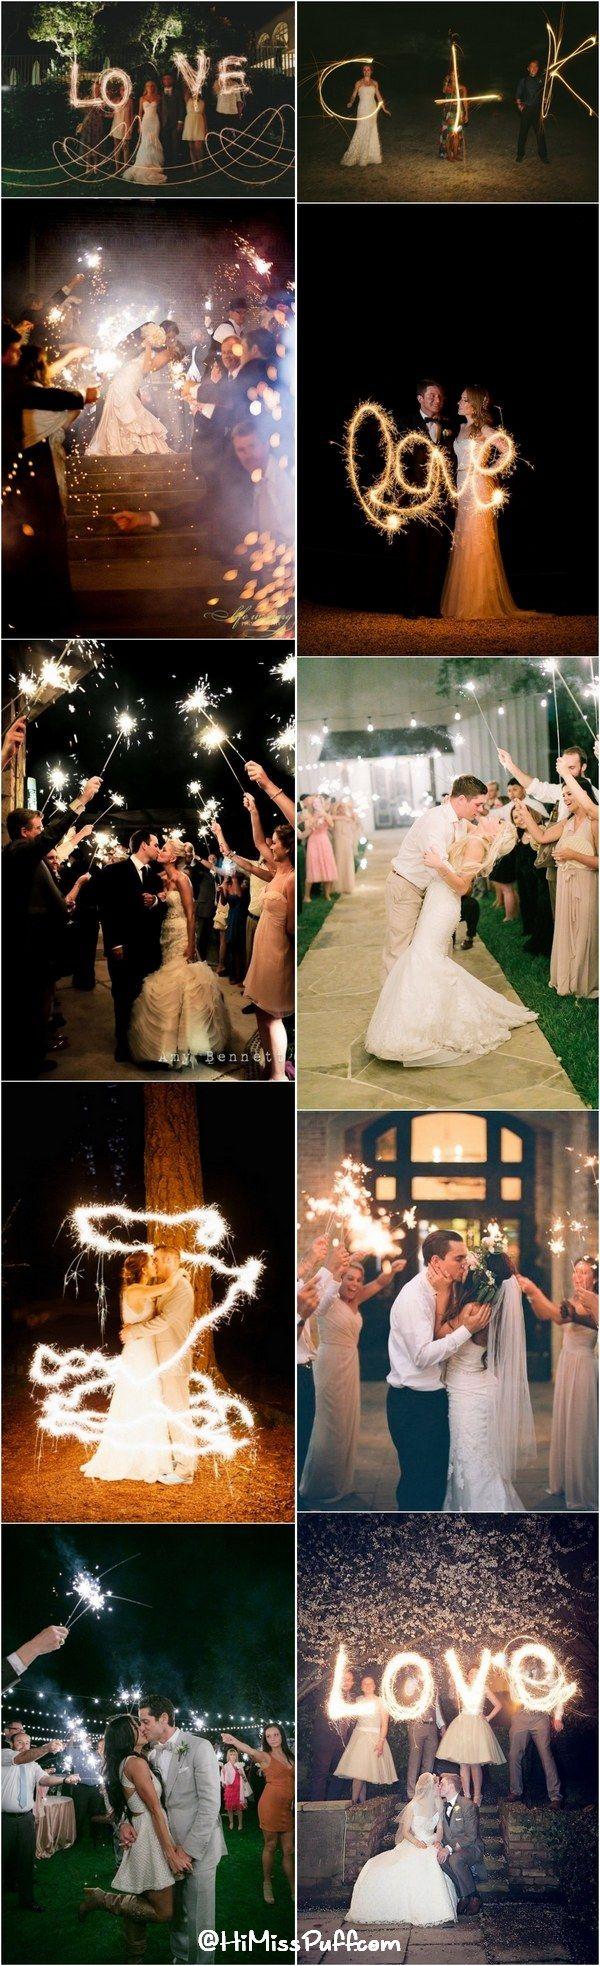 Perky Evening Wedding Ideas Send Off Evening Wedding Ideas Send Off Dress Images Fall Wedding Send Off Ideas Inexpensive Wedding Send Off Ideas ideas Wedding Send Off Ideas